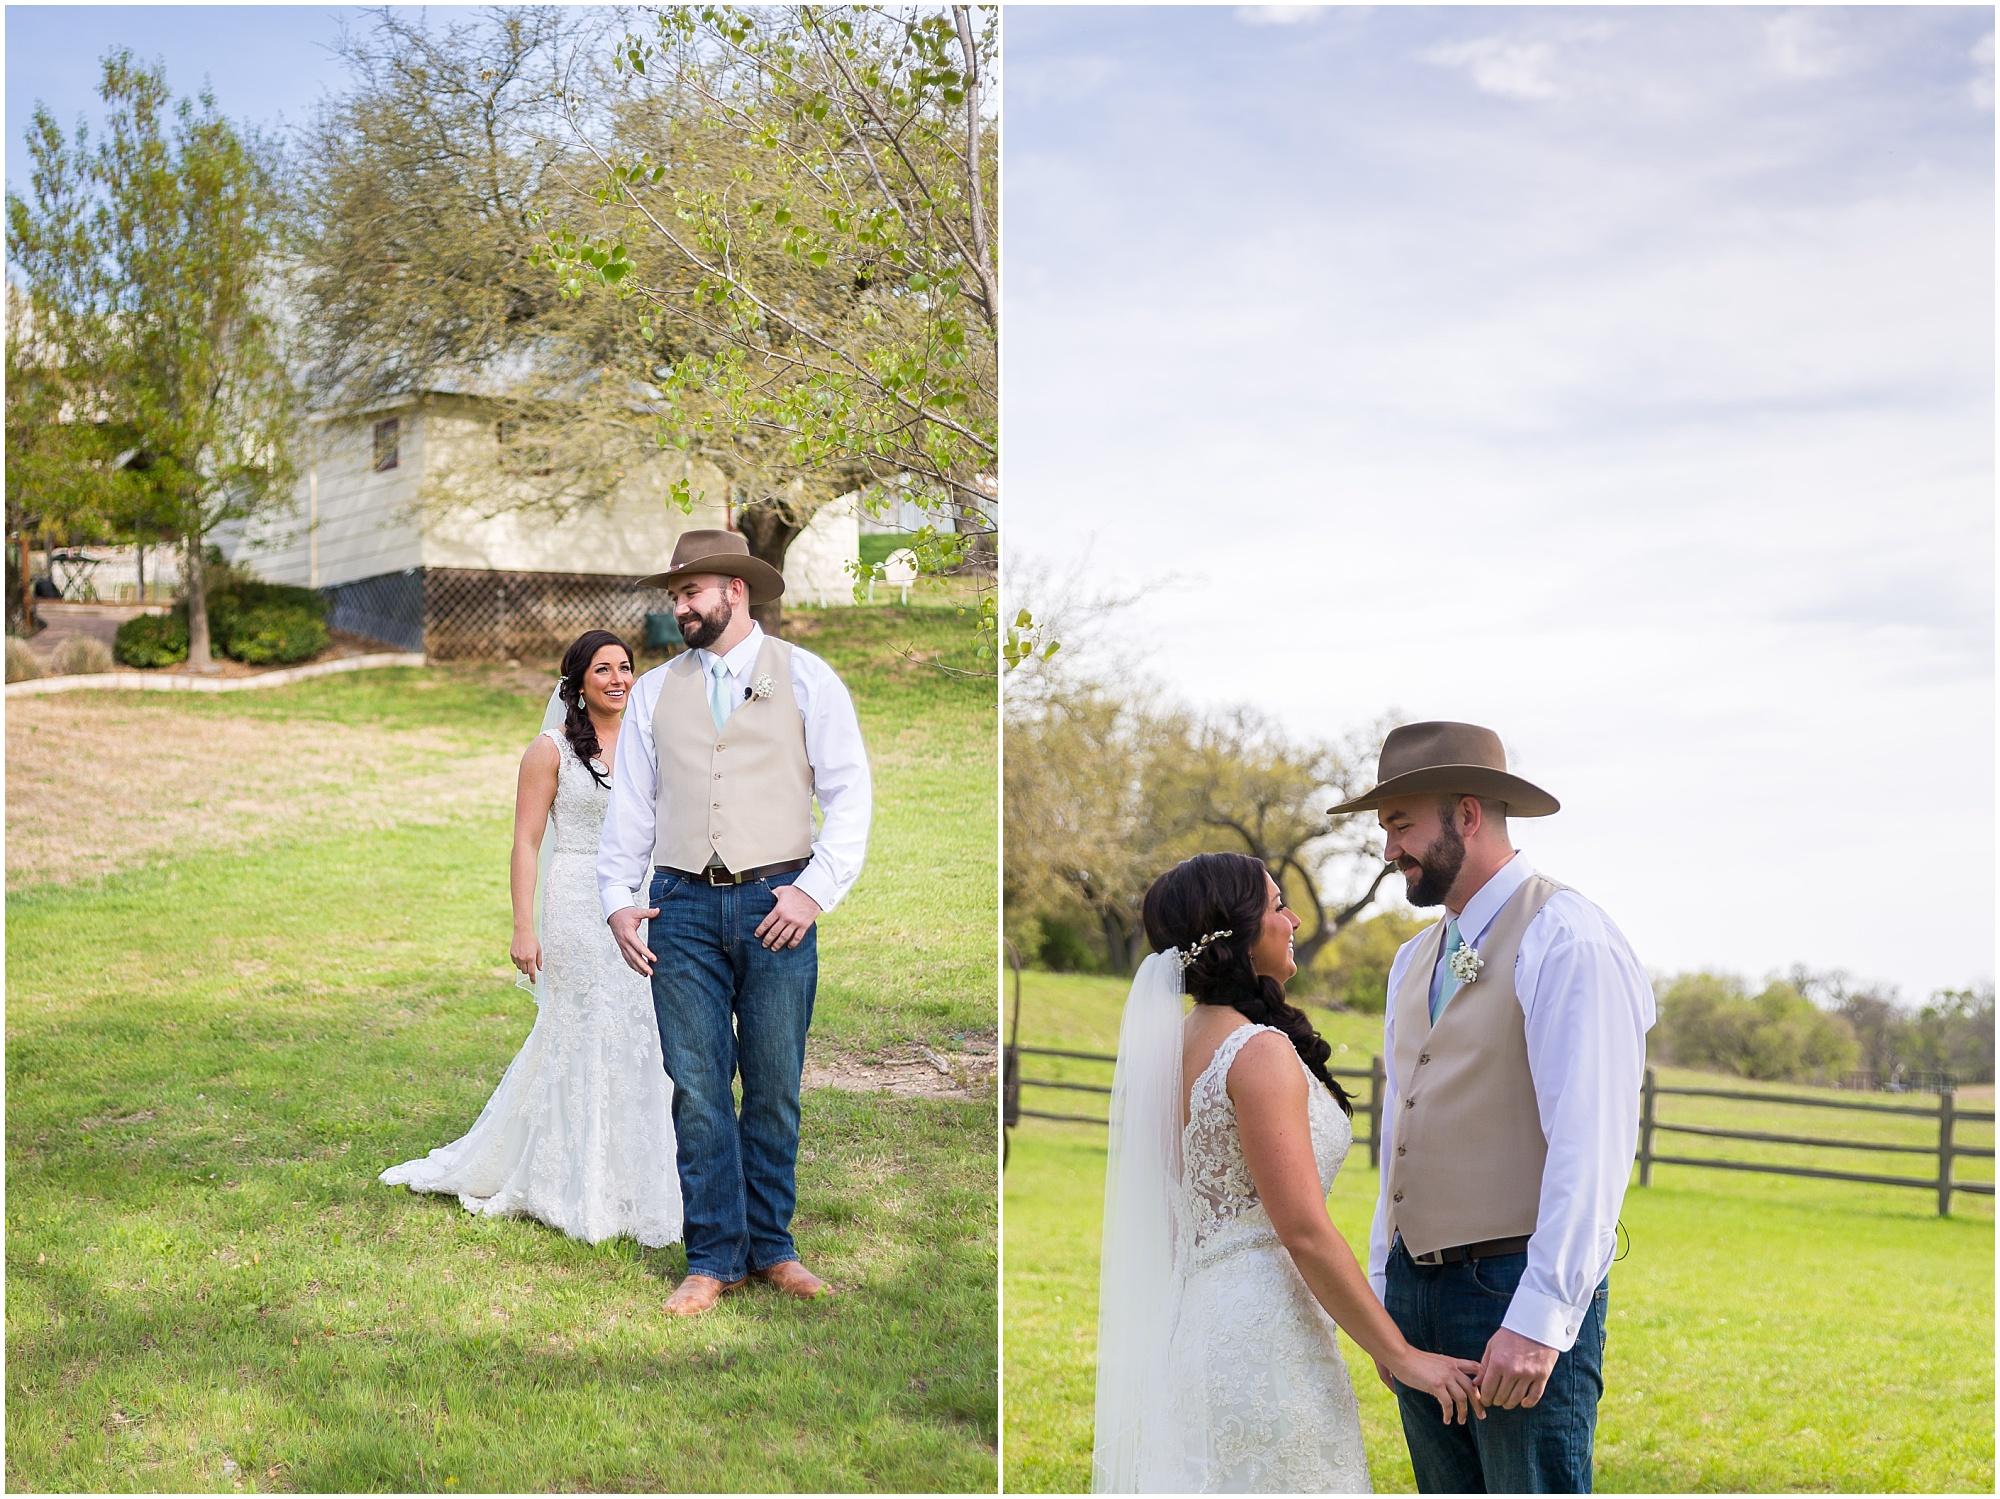 Groom sees bride for the first time at their wedding - Jason & Melaina Photography - www.jasonandmelaina.com